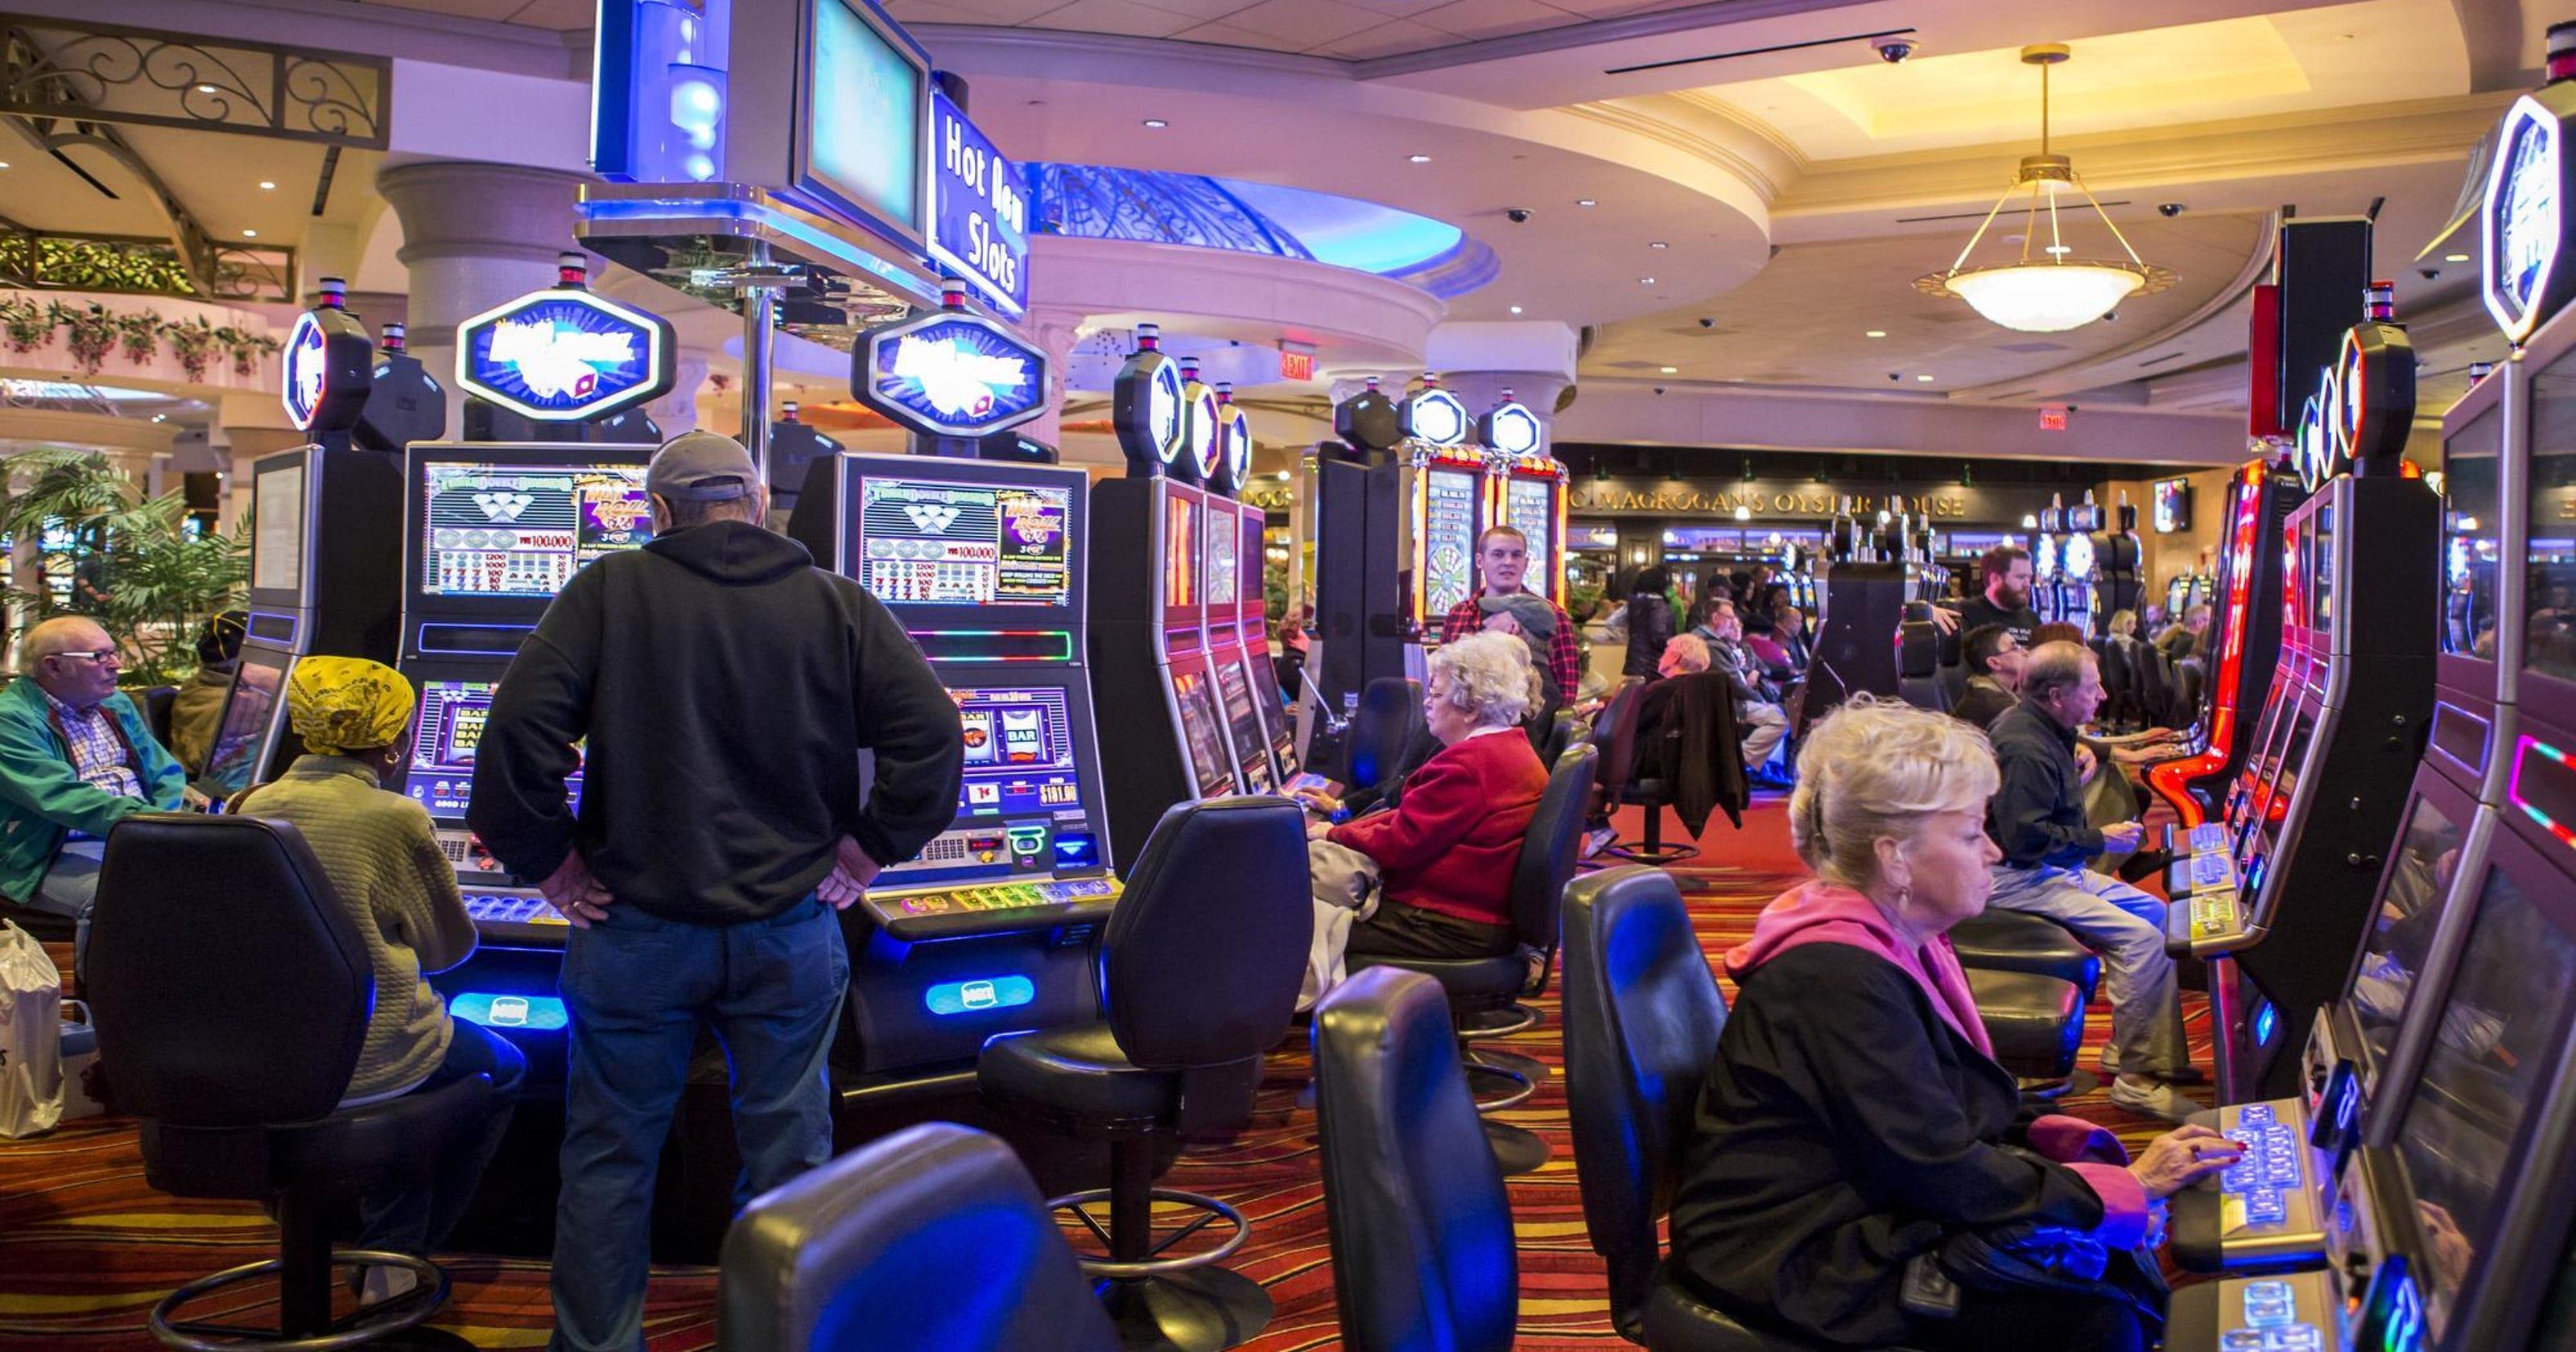 Wk holland casino